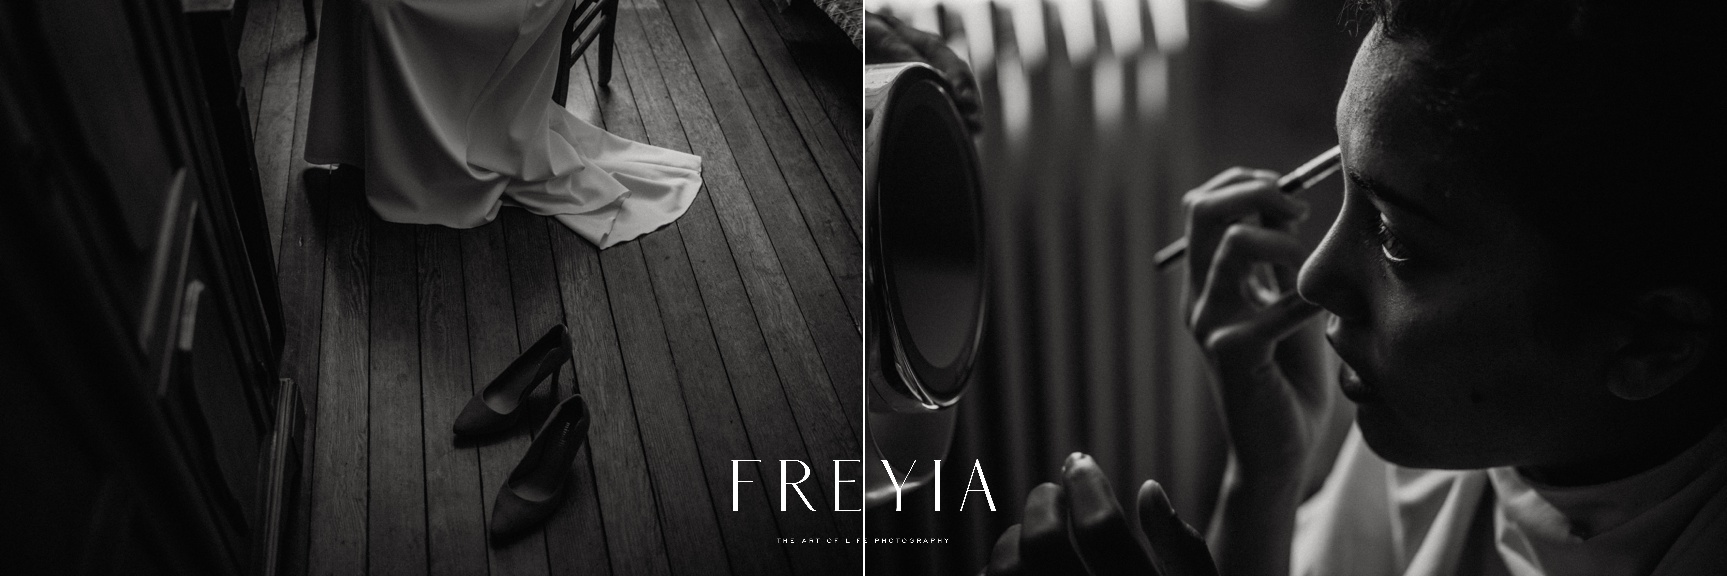 R + T |  mariage reportage alternatif moody intime minimaliste vintage naturel boho boheme |  PHOTOGRAPHE mariage PARIS france destination  | FREYIA photography_-65.jpg